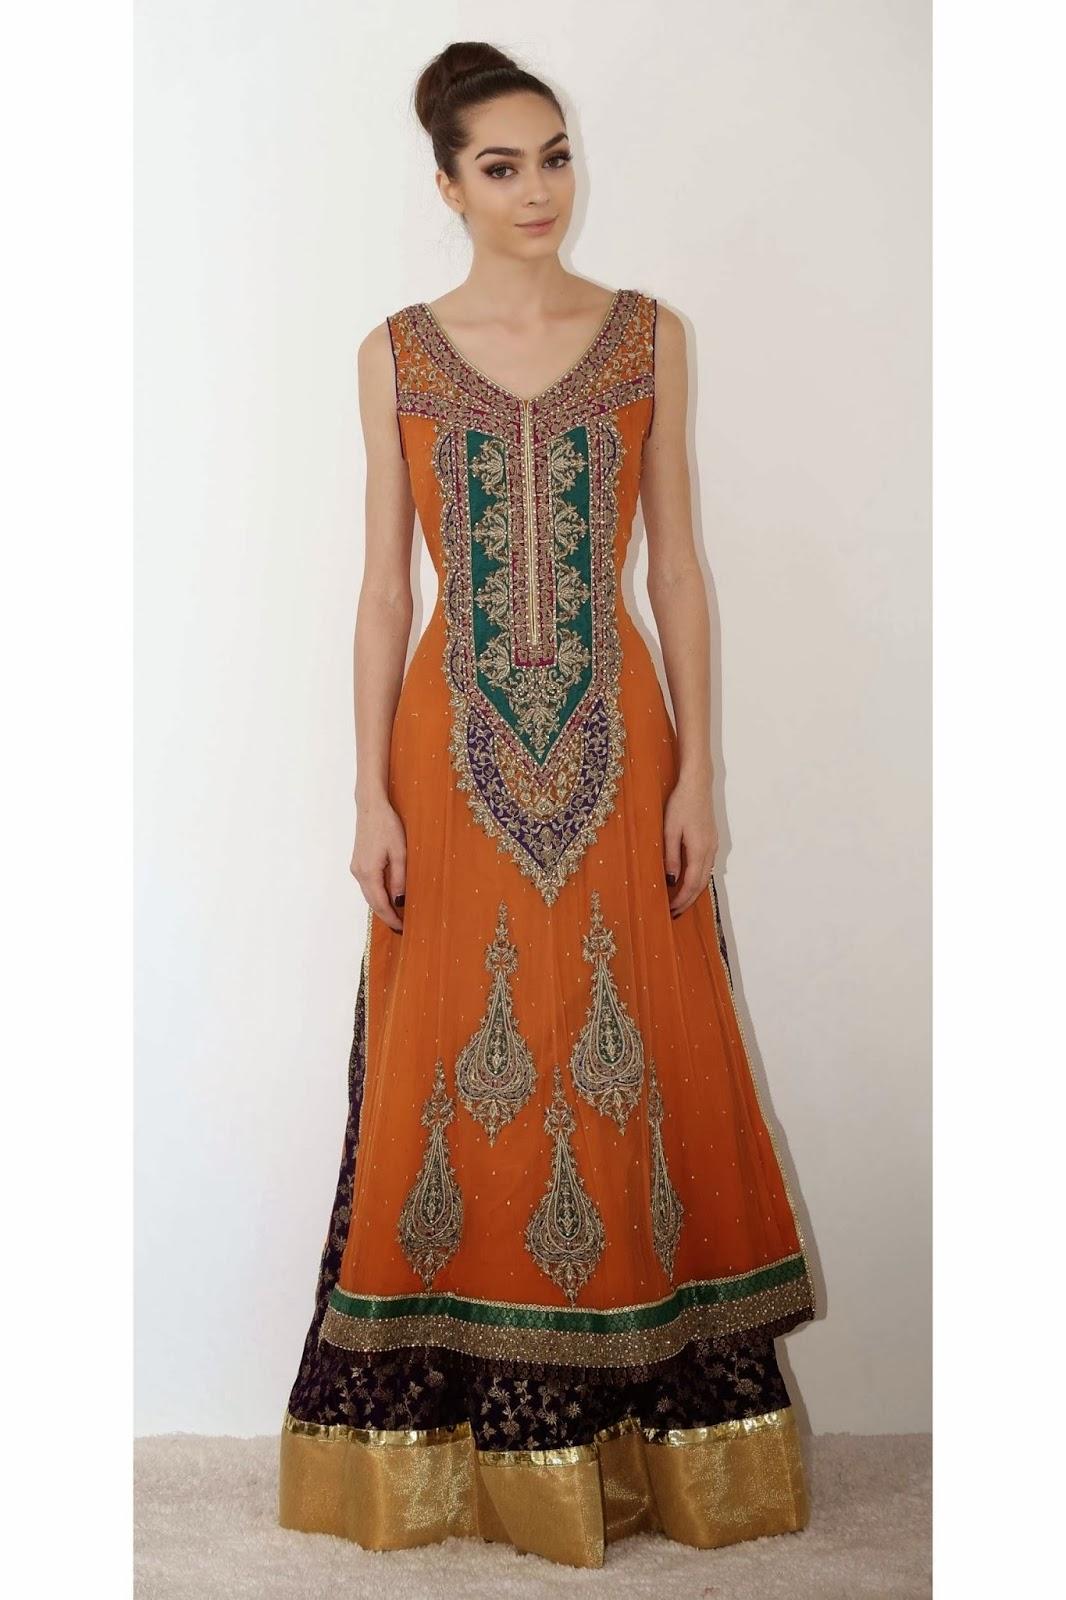 Cheap crystal bodice hi low wedding dresses wedding dresses for High low wedding dresses cheap